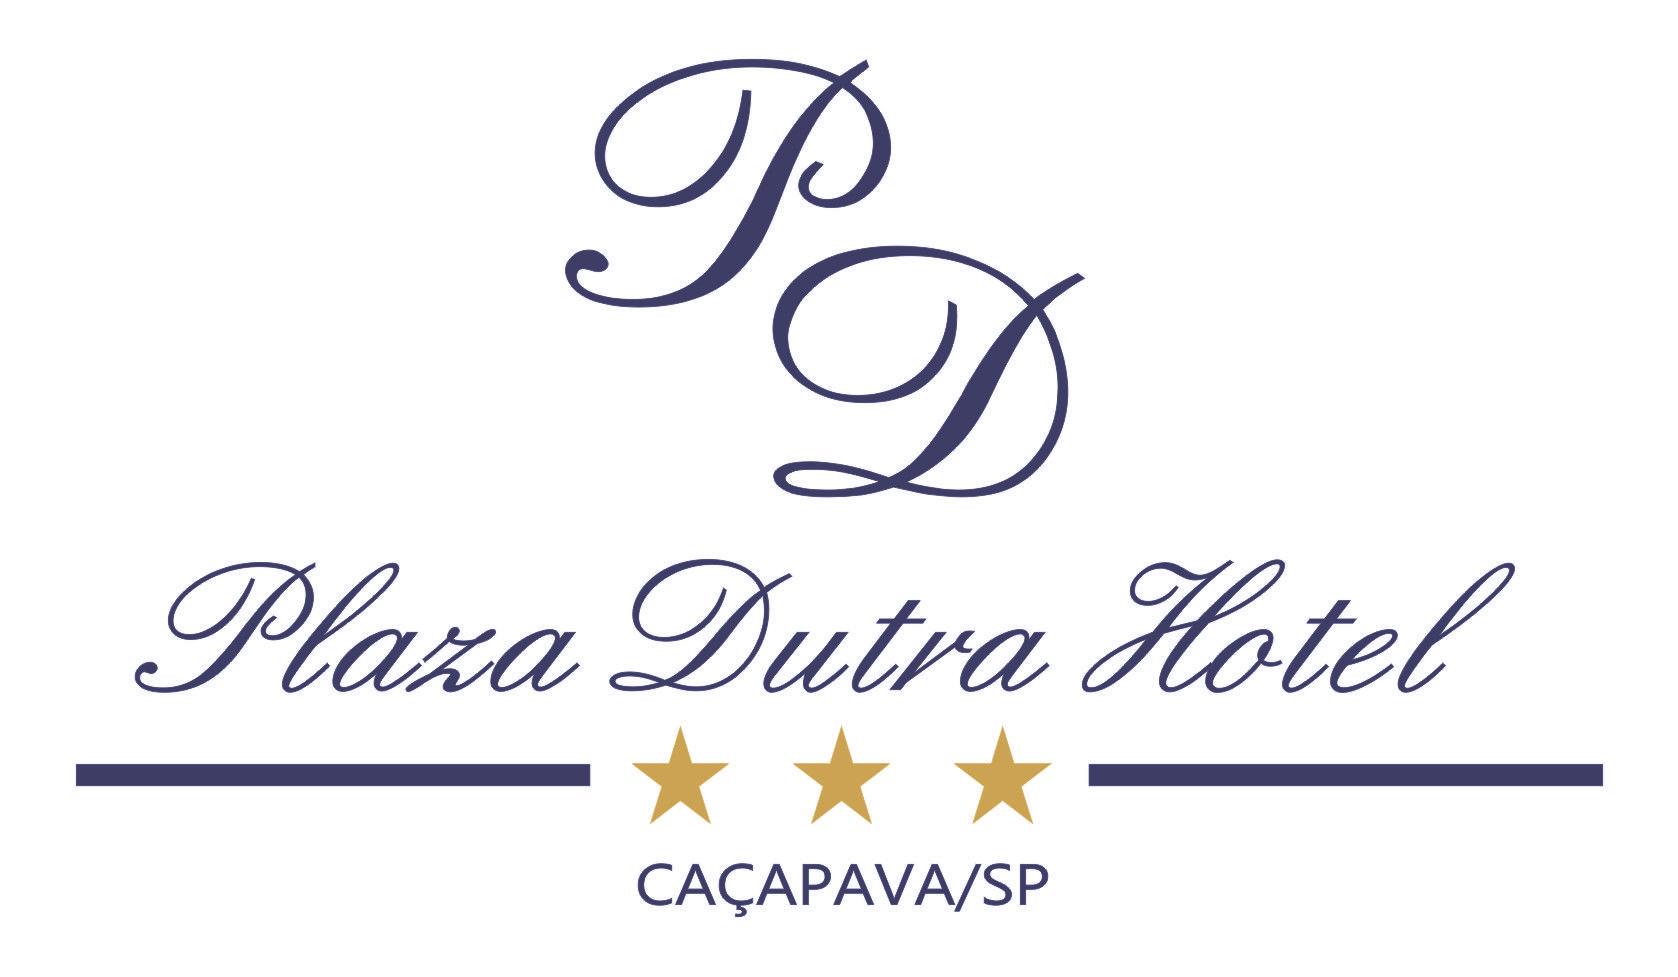 Plaza Dutra Hotel